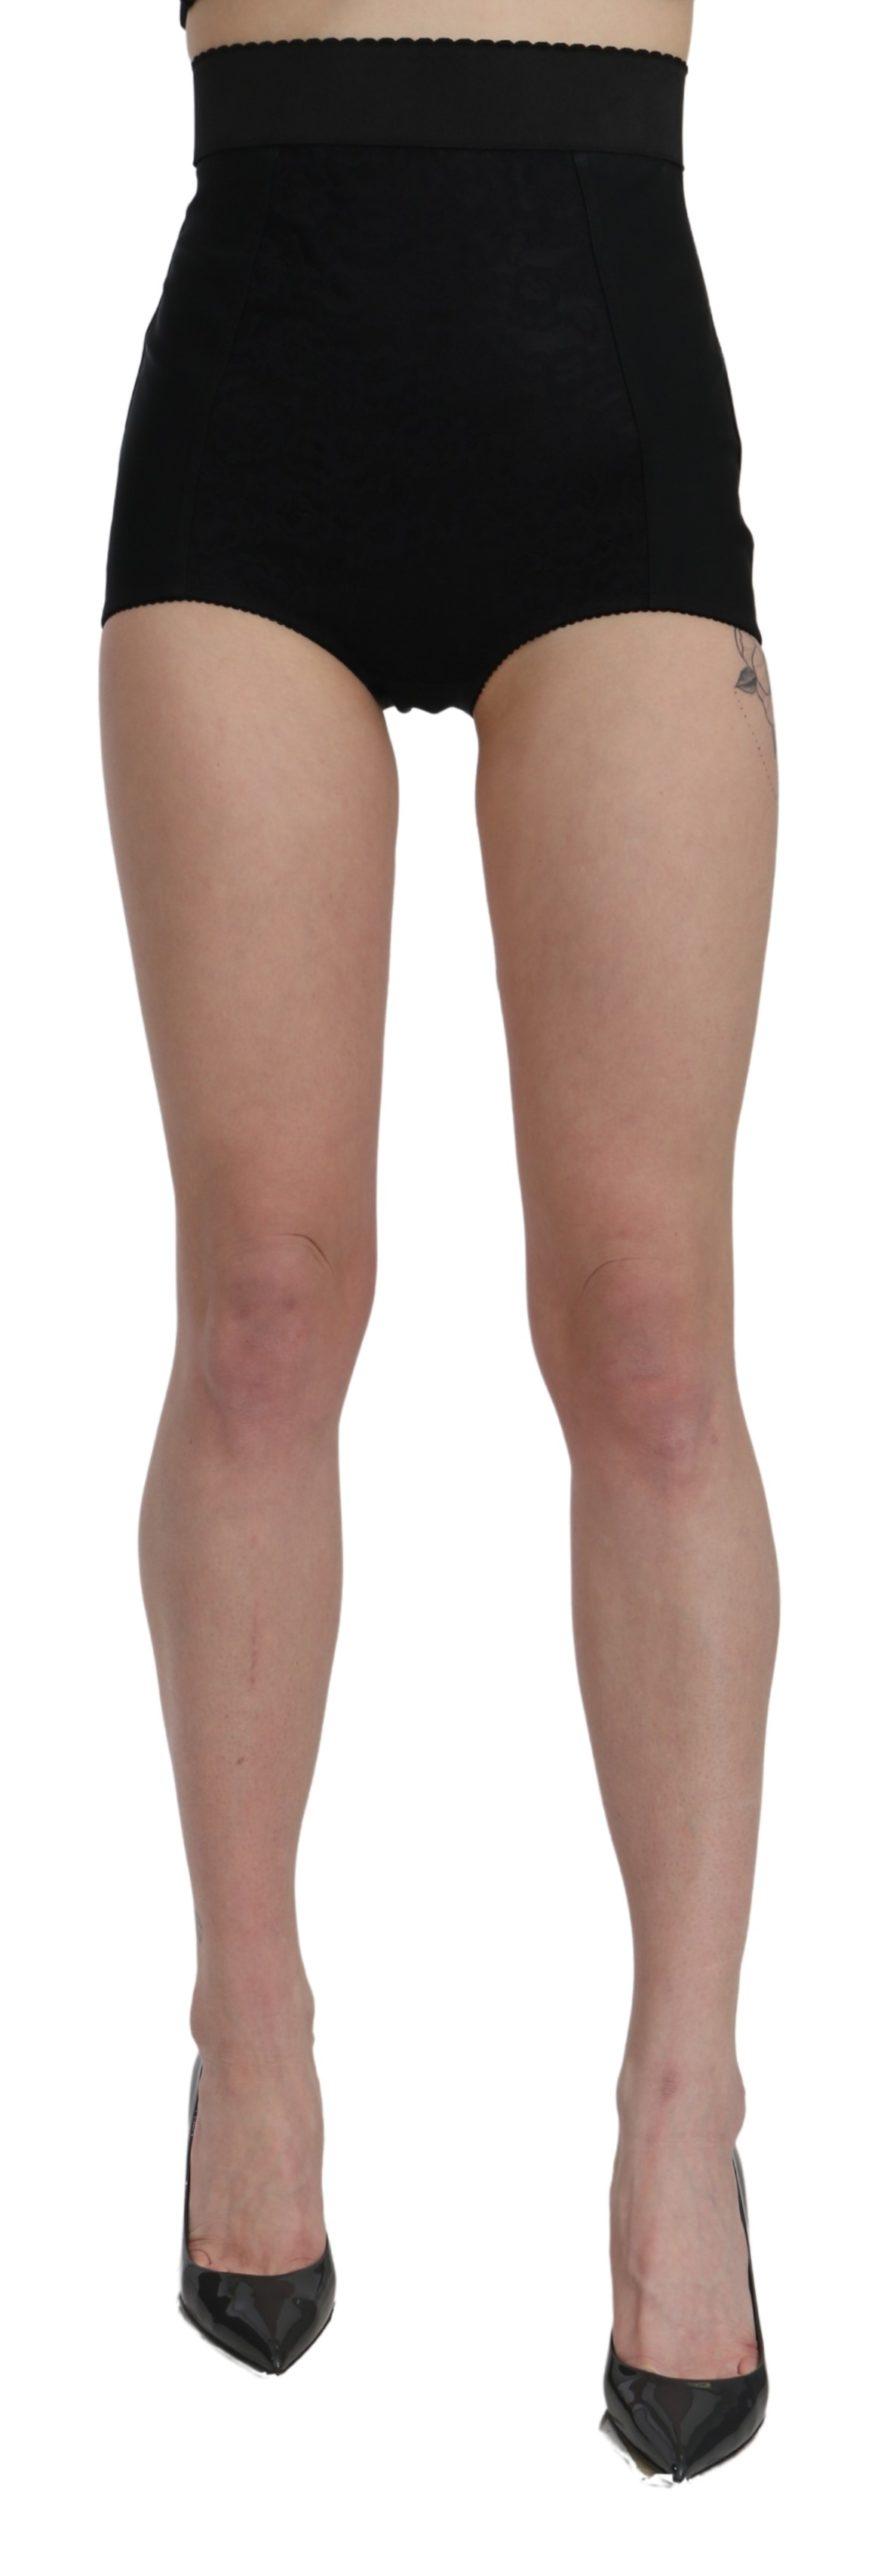 Dolce & Gabbana Women's High Waist Mini Hot Pants Nylon Shorts Black SKI1452 - IT40|S